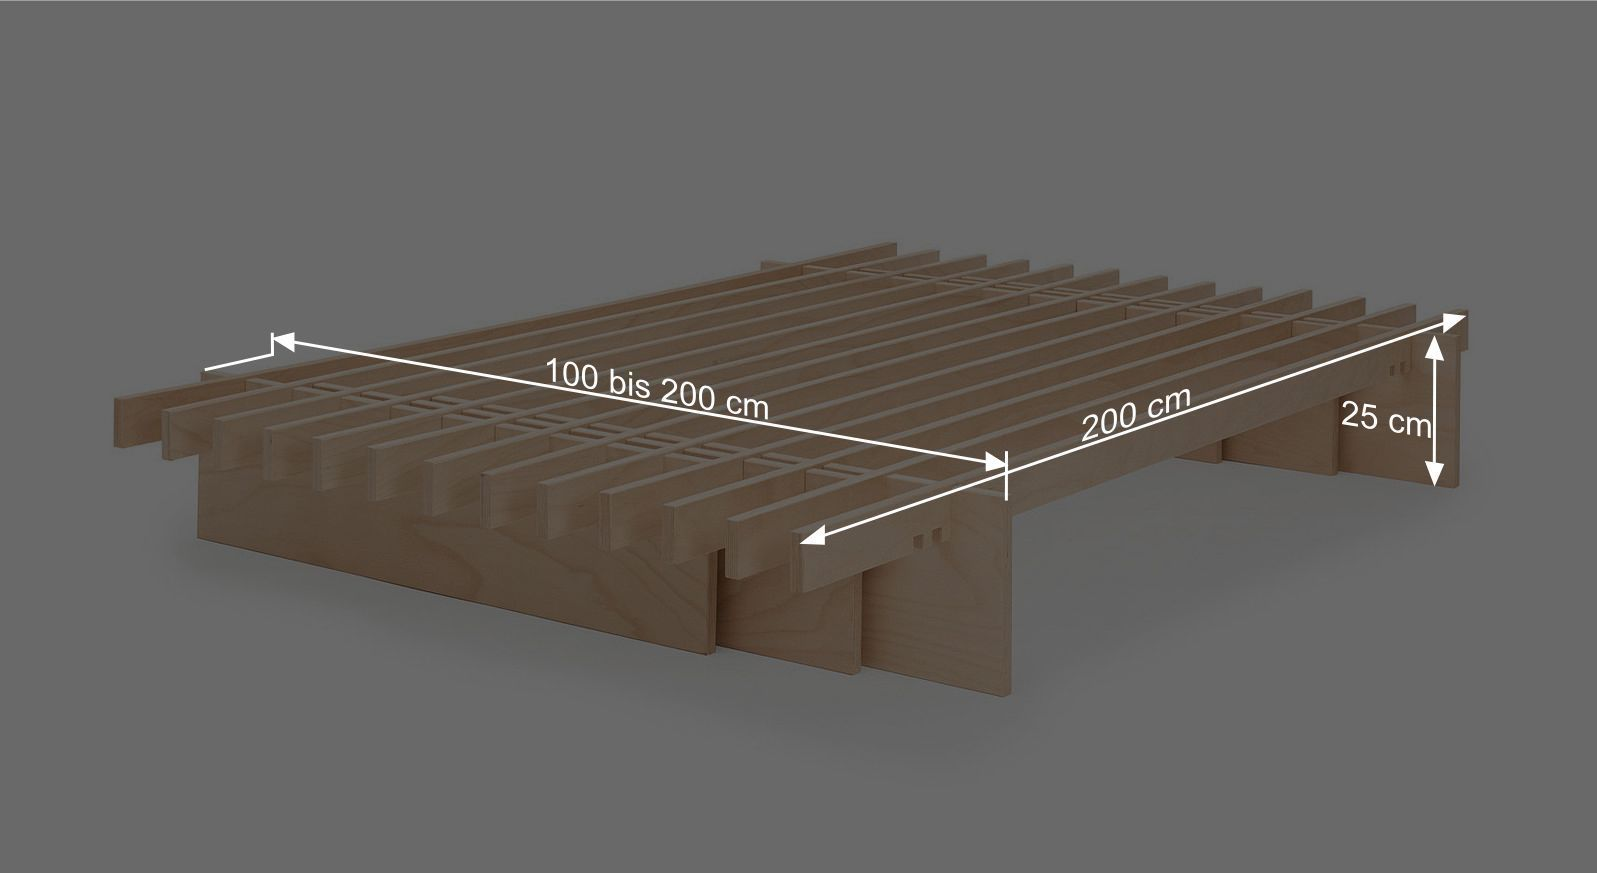 Bemaßungsgrafik zum Bettsystem Tojo Parallel